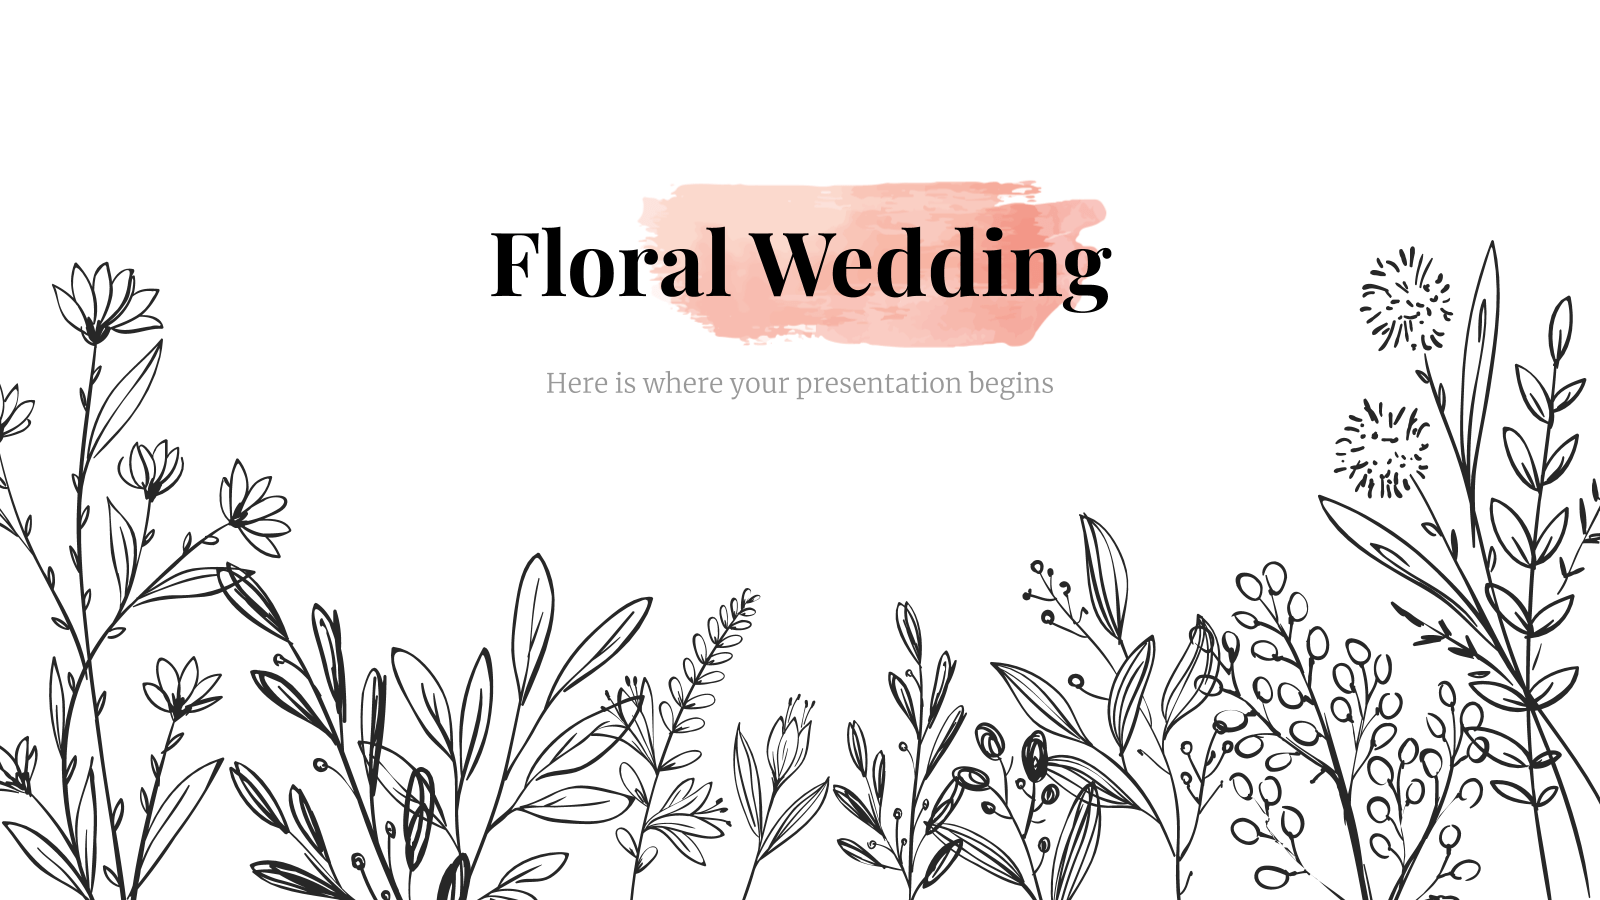 Boda floral